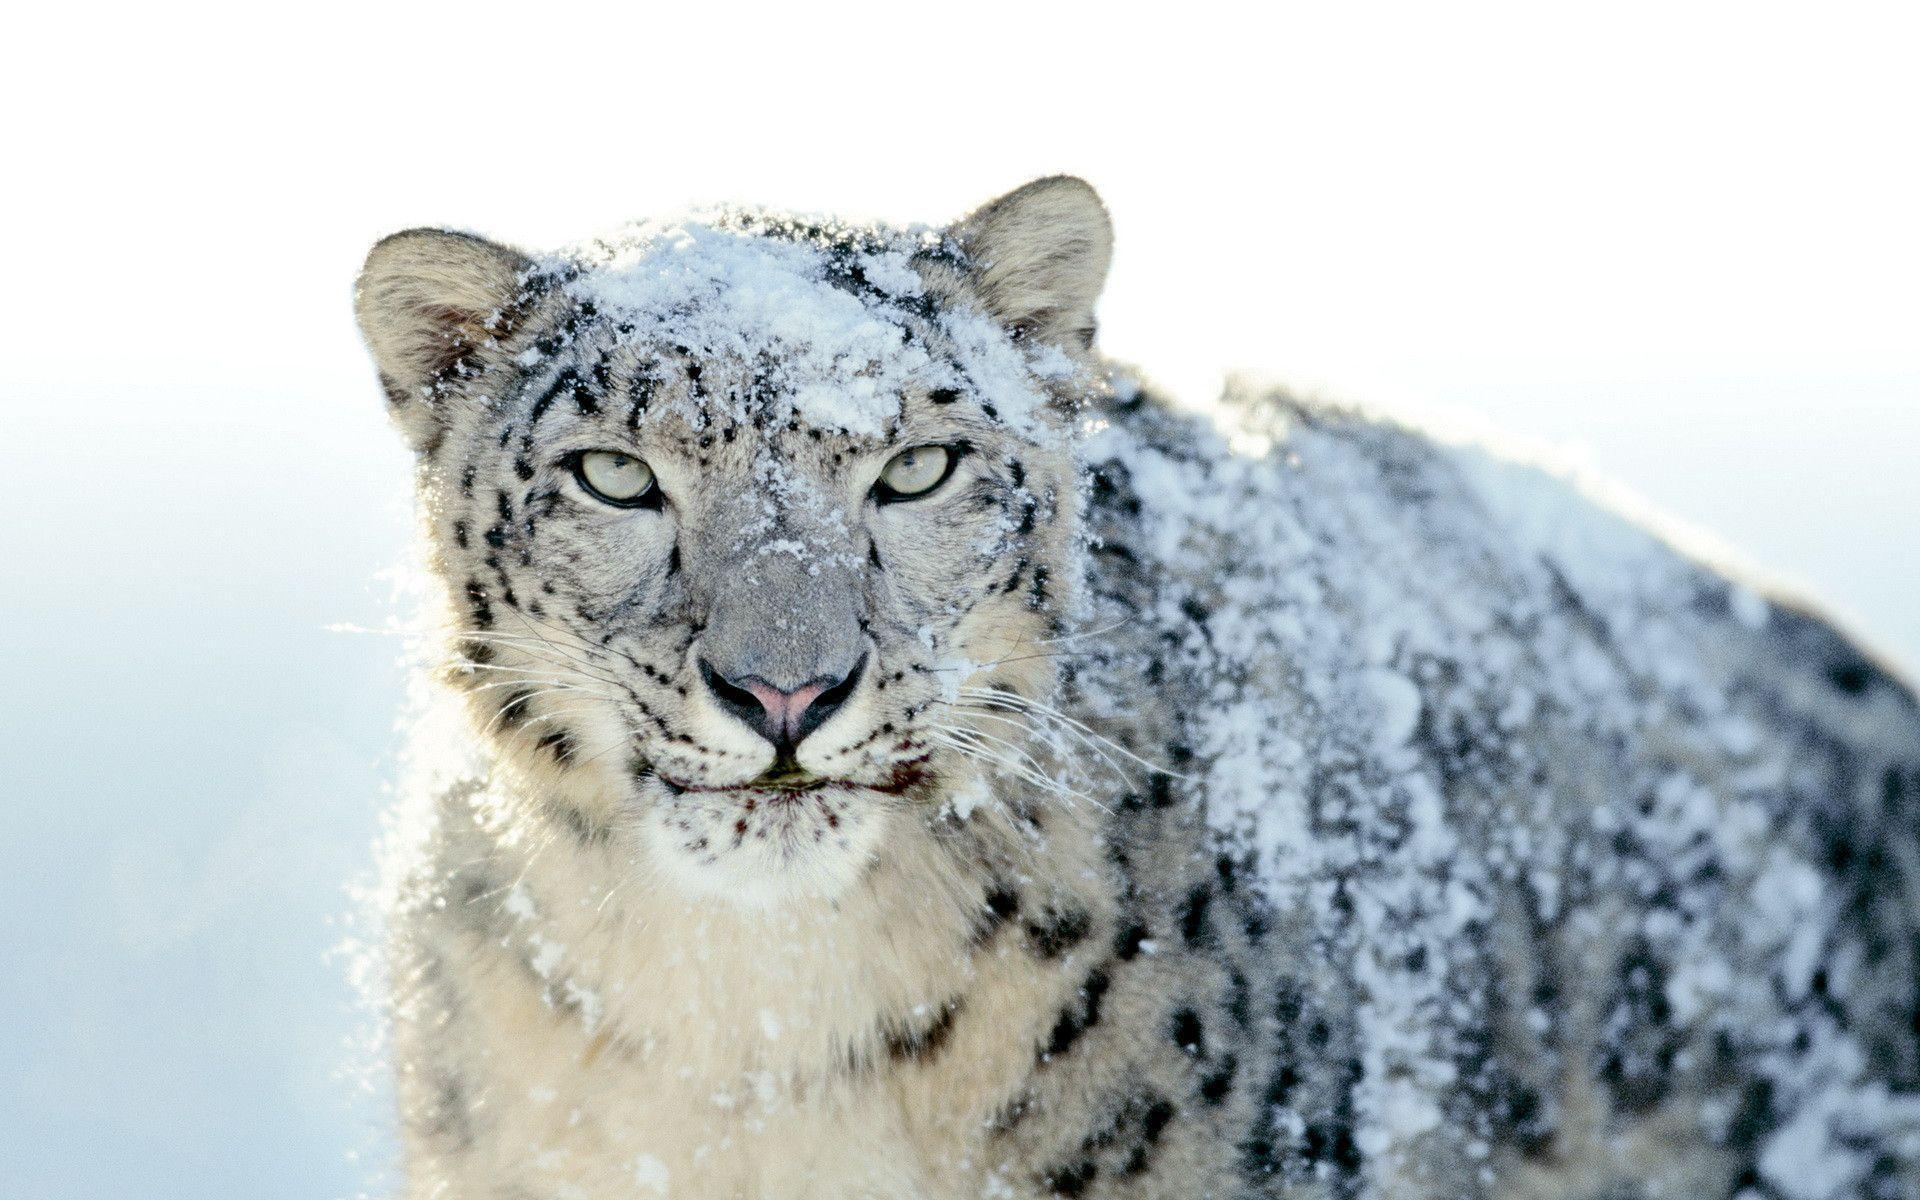 Must see Wallpaper Mac Snow Leopard - 6M7eOOq  Snapshot_646688.jpg